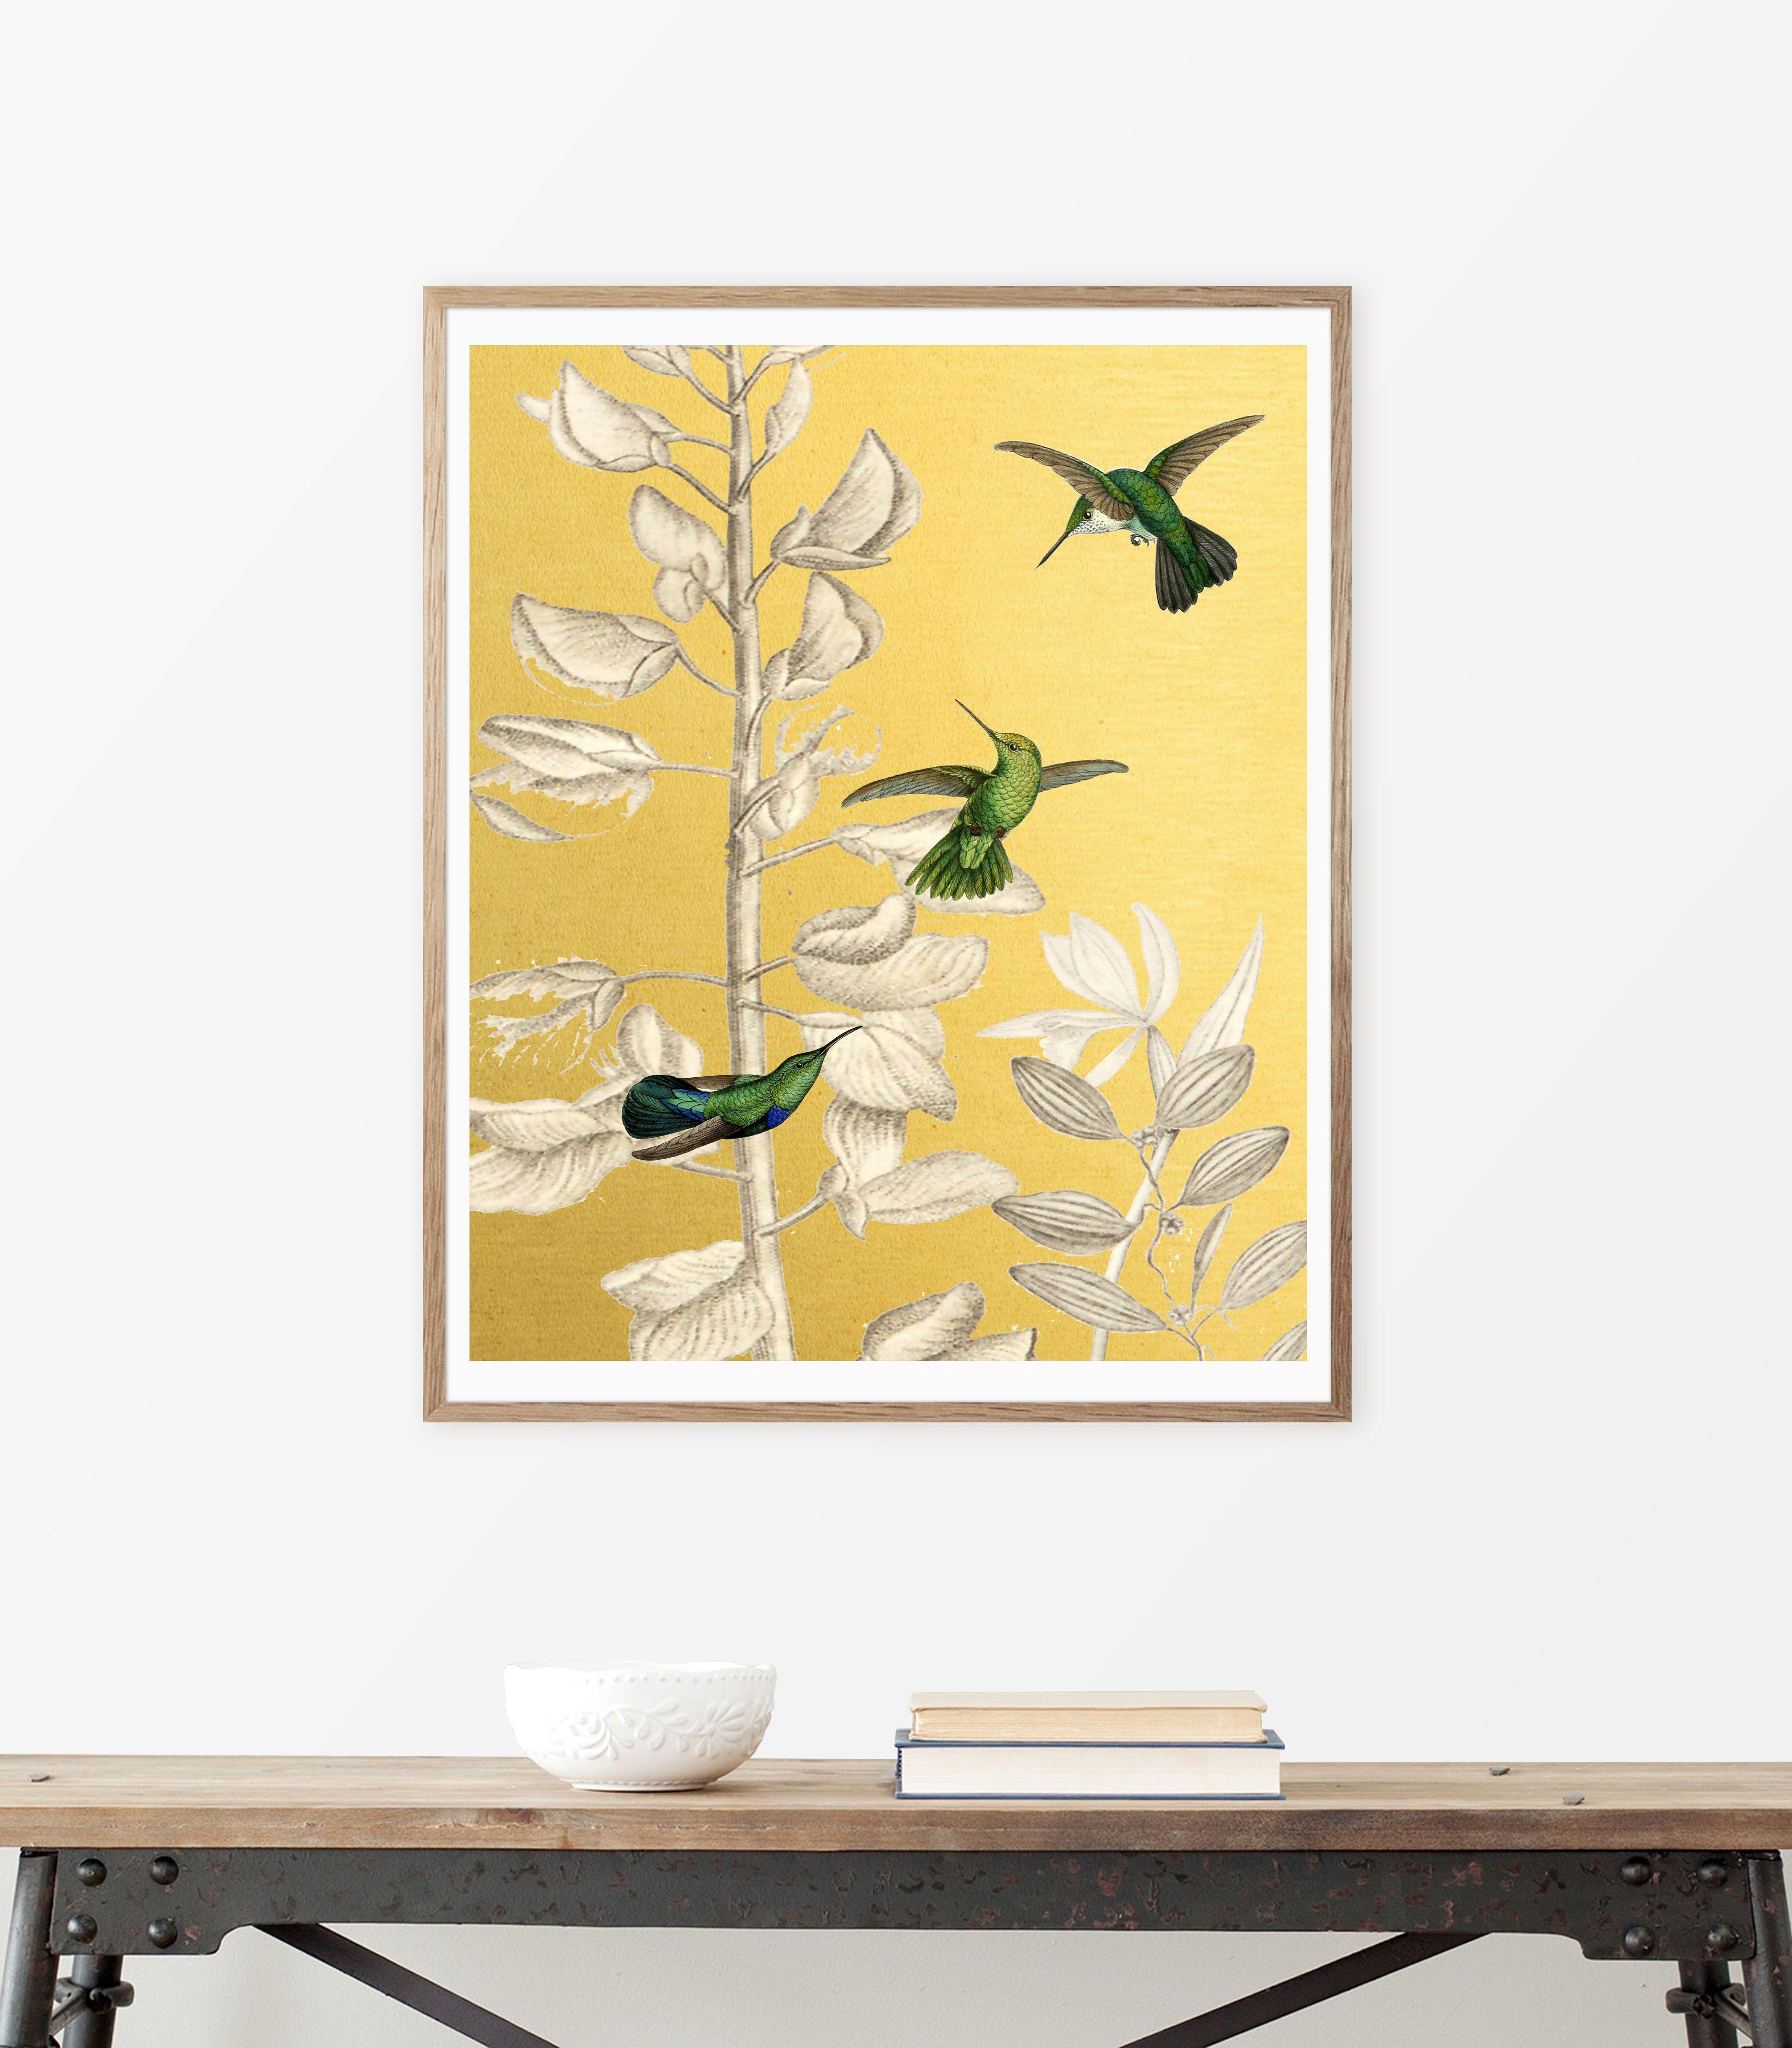 Printable Art, Humming Birds, Poster, Prints, Wall Art, Digital Art ...